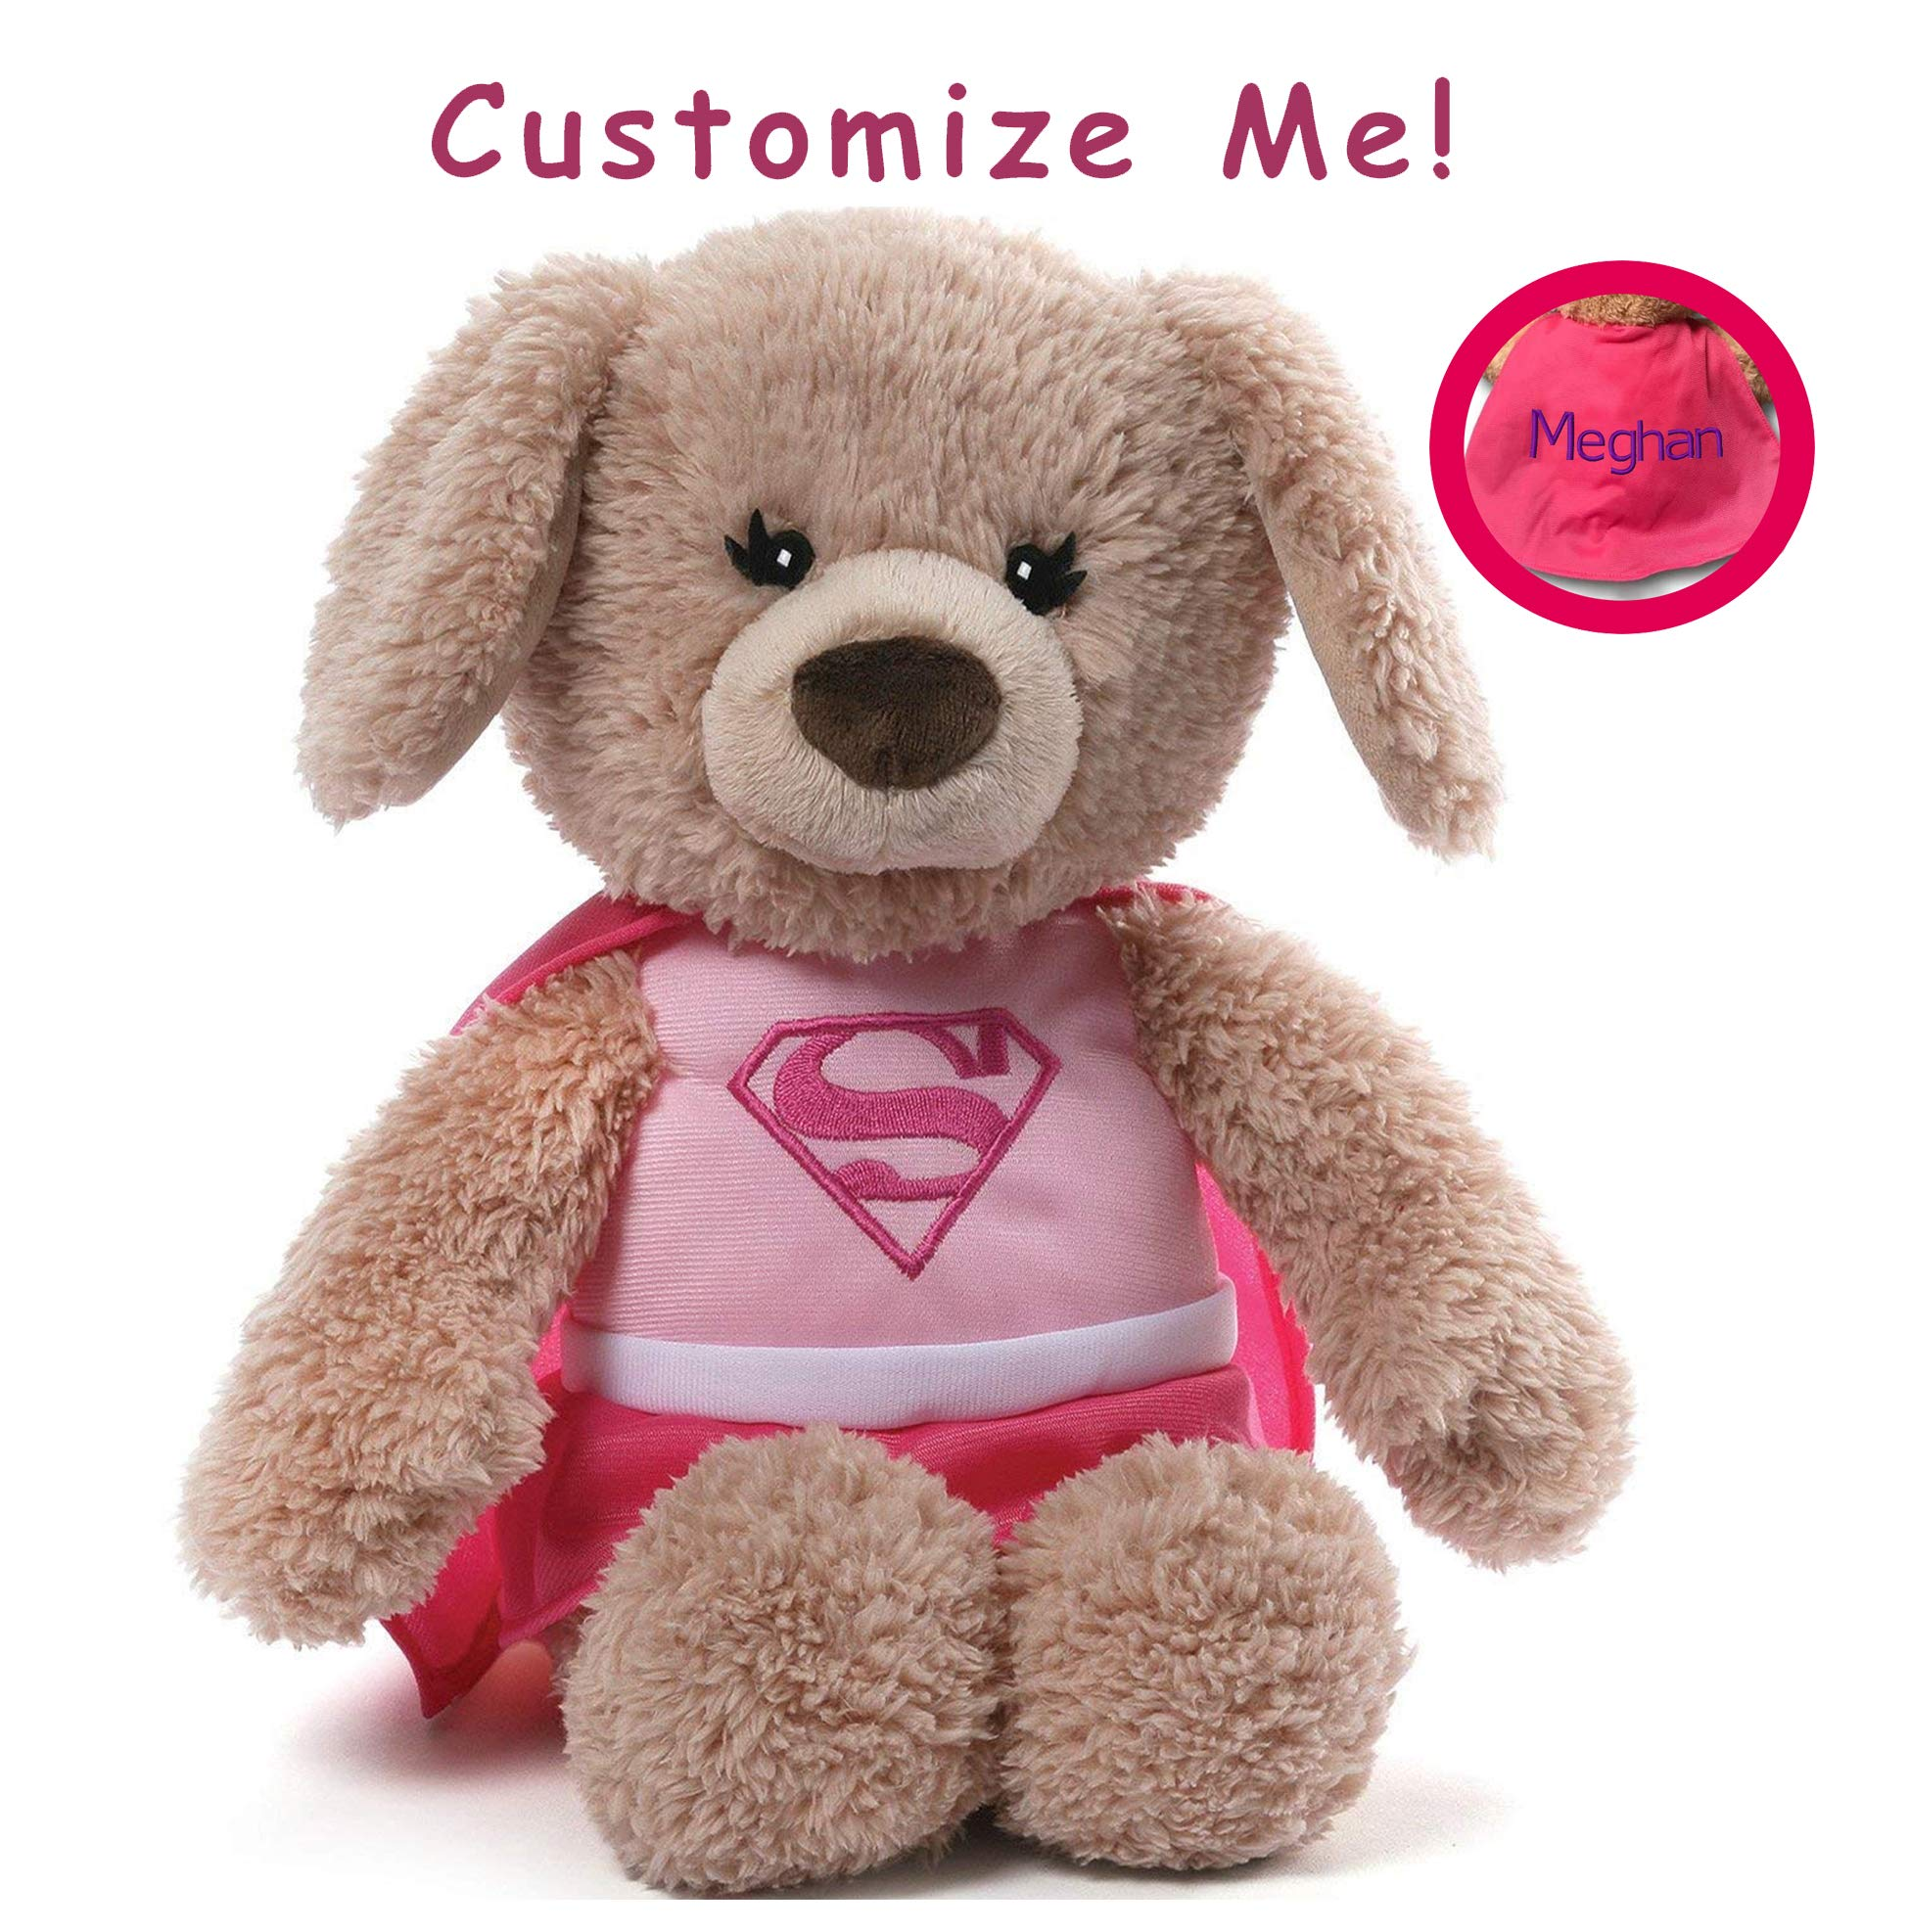 GUND Personalized DC Comics Supergirl Yvette Dog Stuffed Animal Plush, Pink, 12'' by GUND